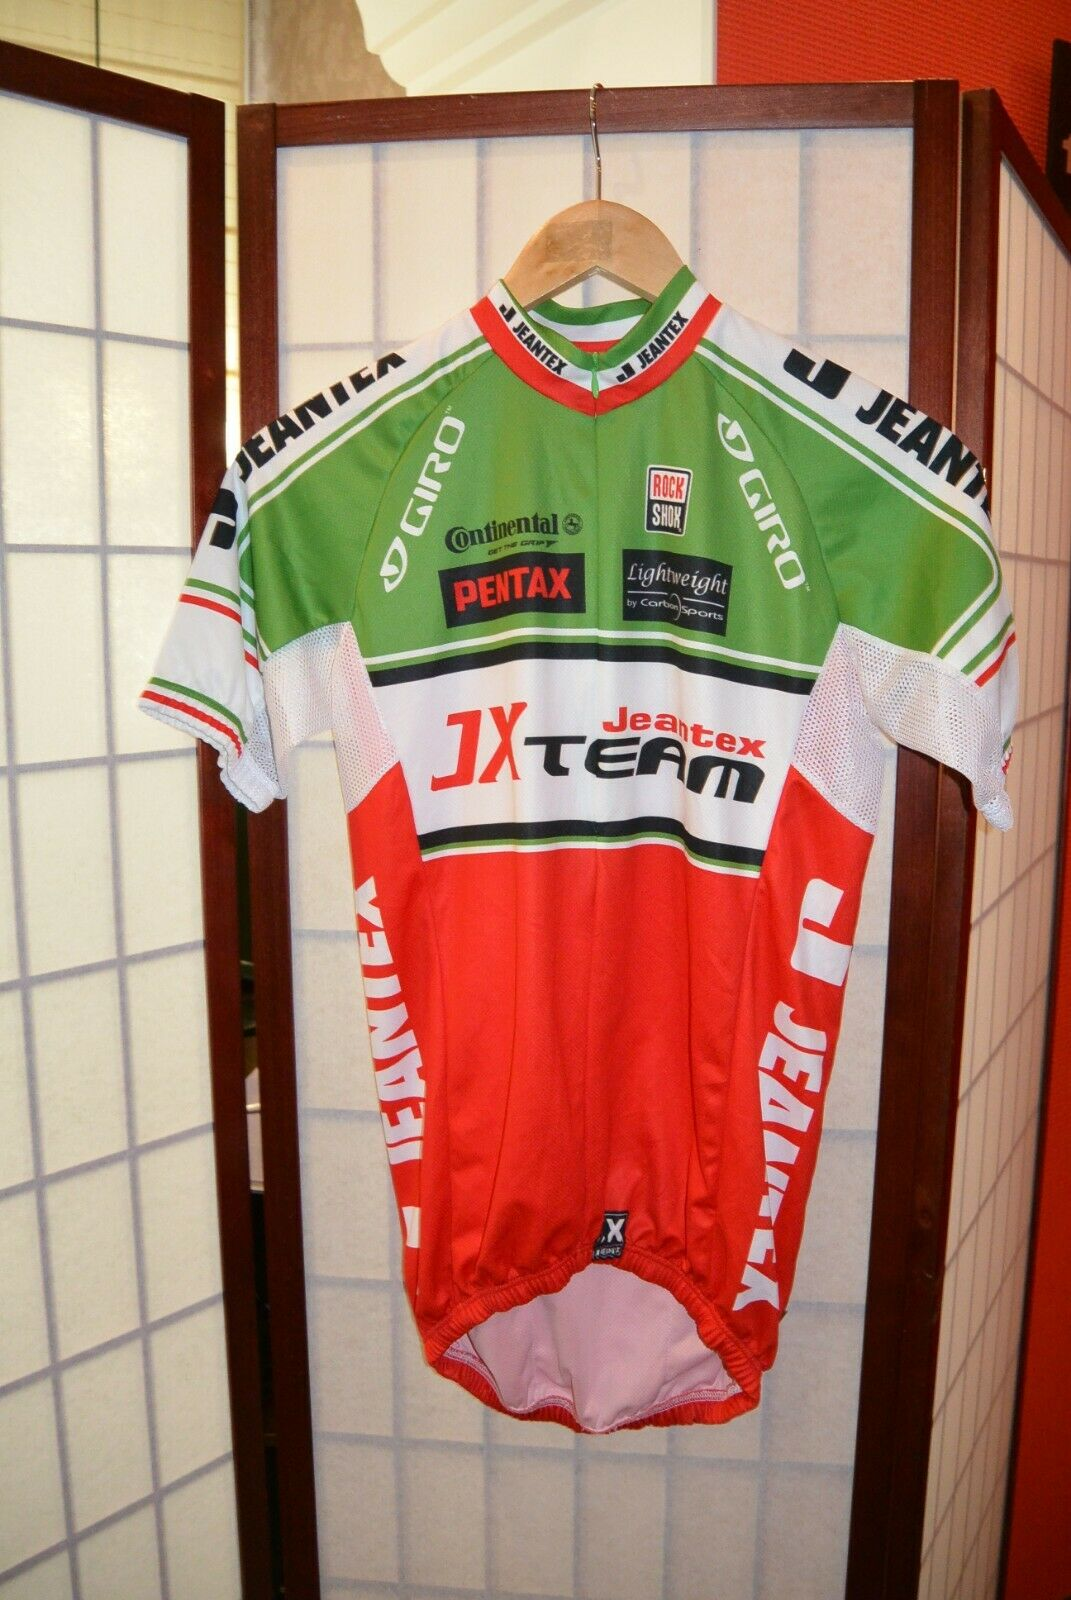 JX SQUADRA Pentax ITALIA TEAM Retrò Vintage Ciclismo Jersey S  141